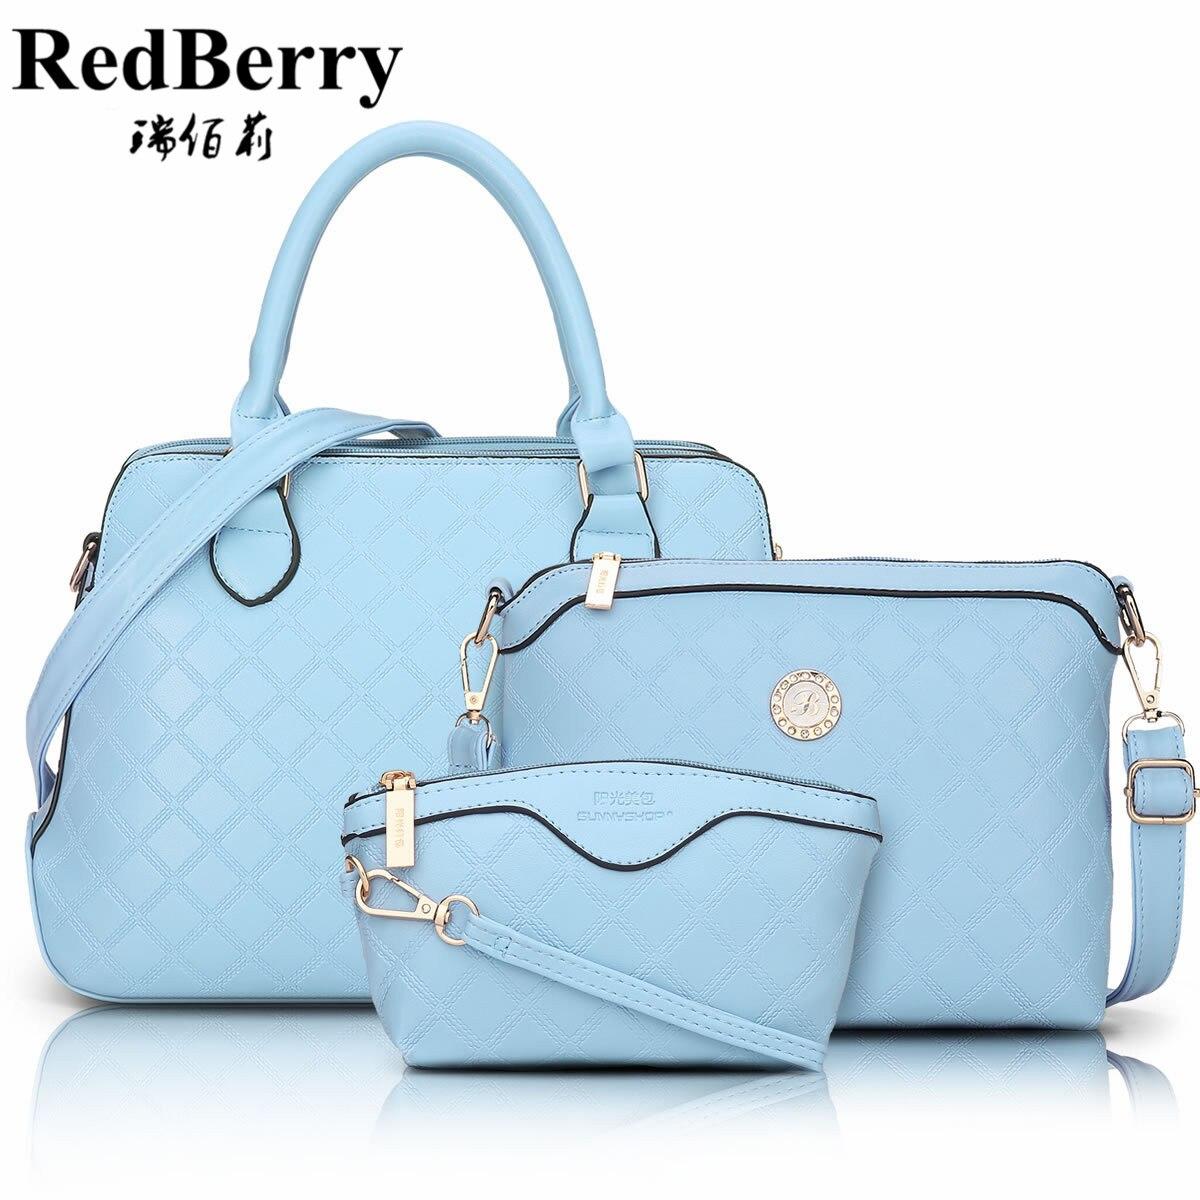 Women Bag Composite Top PU Leather Spring Fashion Handbag Shoulder Crossbody Black Pink Luxury Ladies Famous Brand New Solid